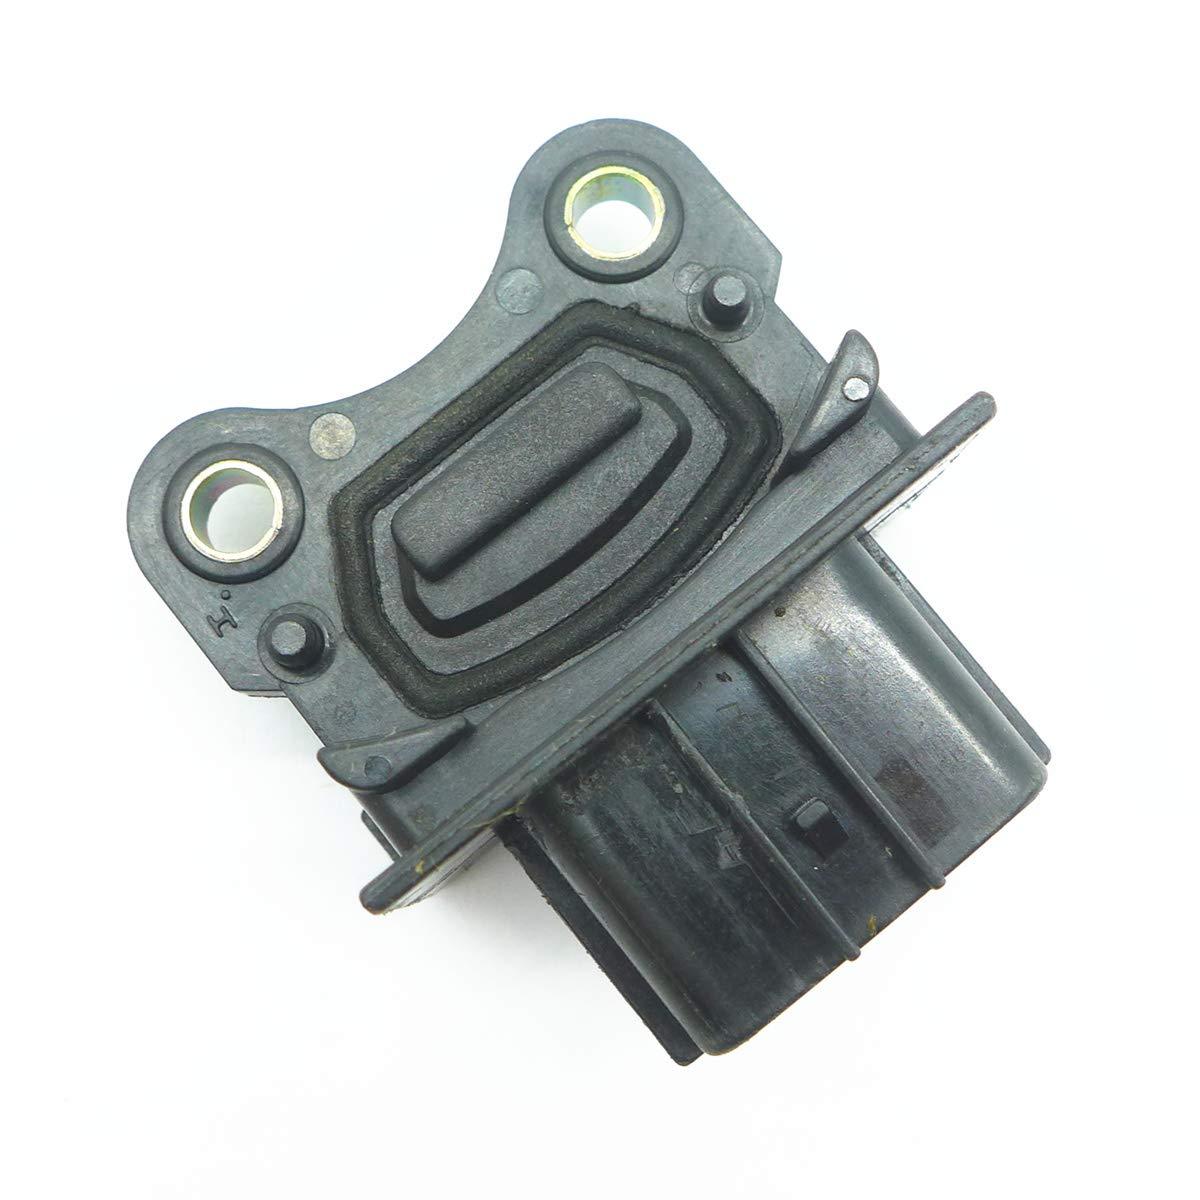 Bosting Ignition Module Crank Angle Sensor for 1991-1995 Geo Suzuki Tracker Suzuki Sidekick 1.6L TBI 8 Valves 3 Pin Plug Replace OE# J811 T2T54471 33100-56B11